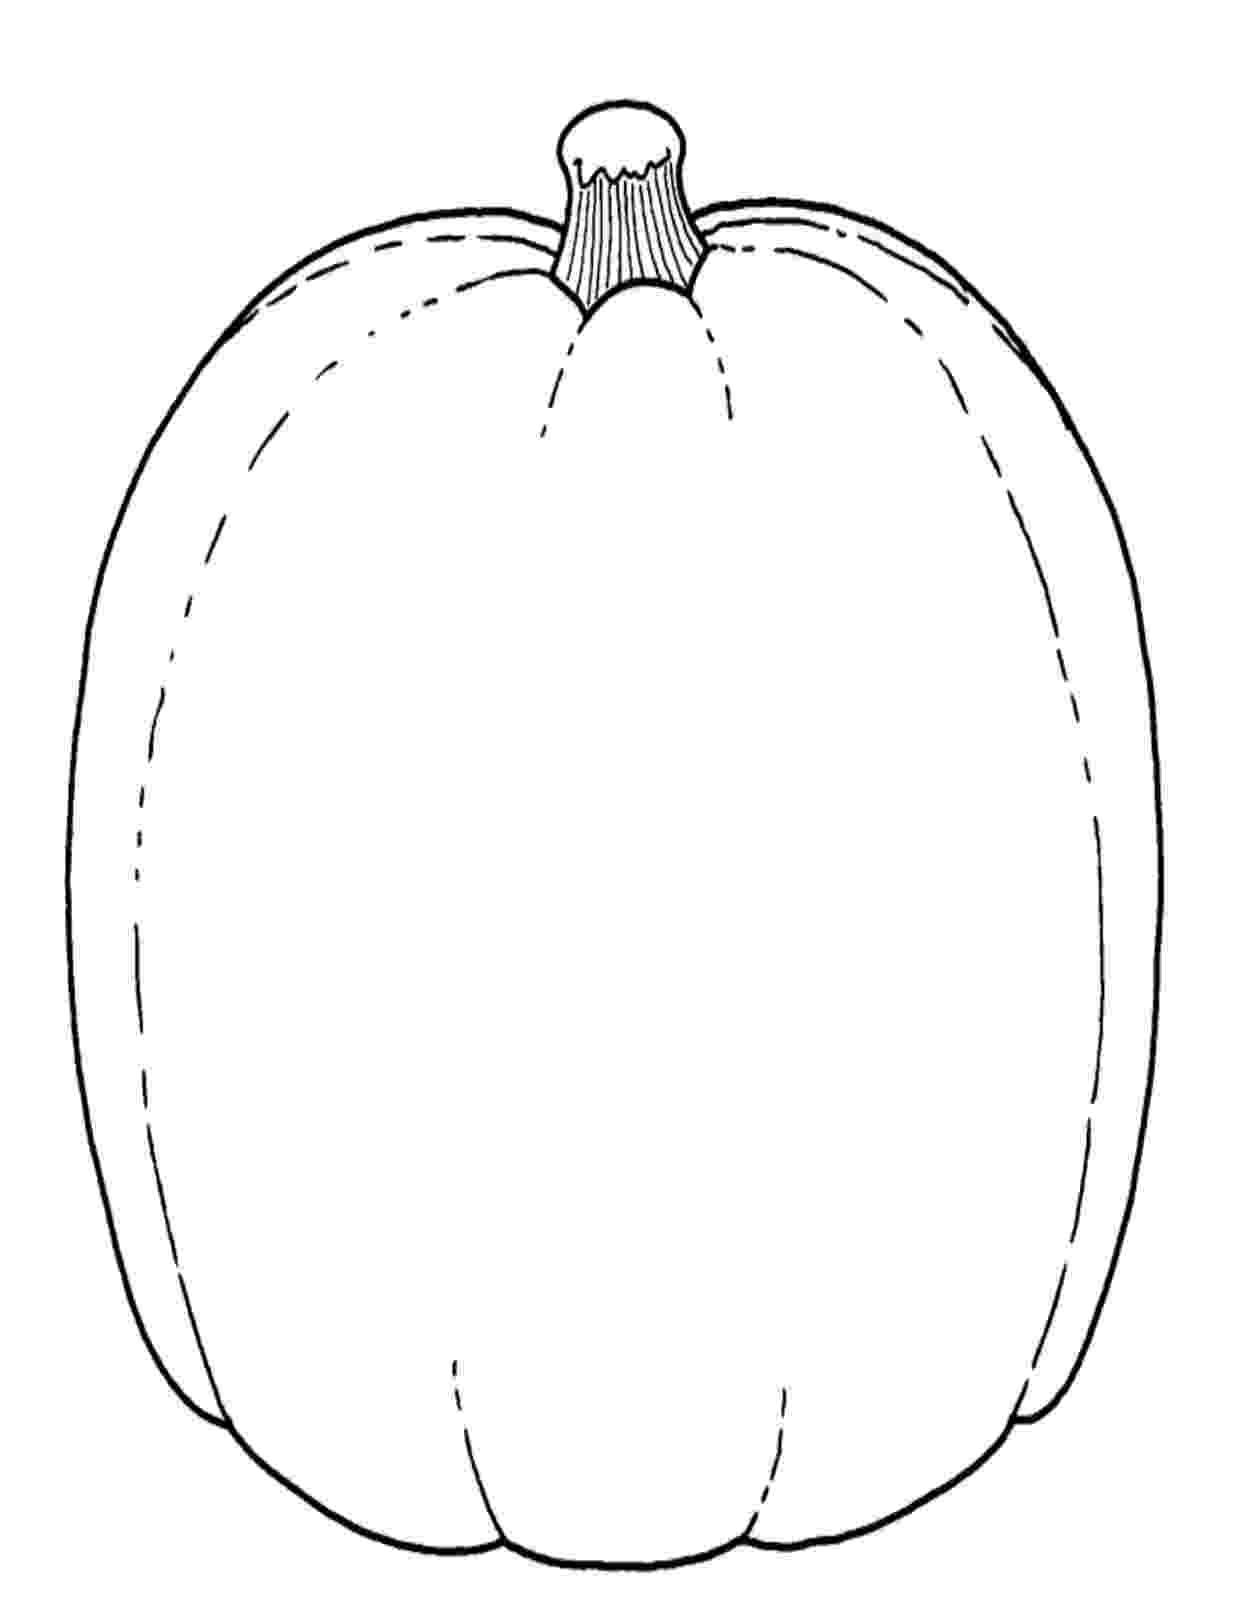 blank pumpkin template blank pumpkin coloring page supercoloringcom template blank pumpkin